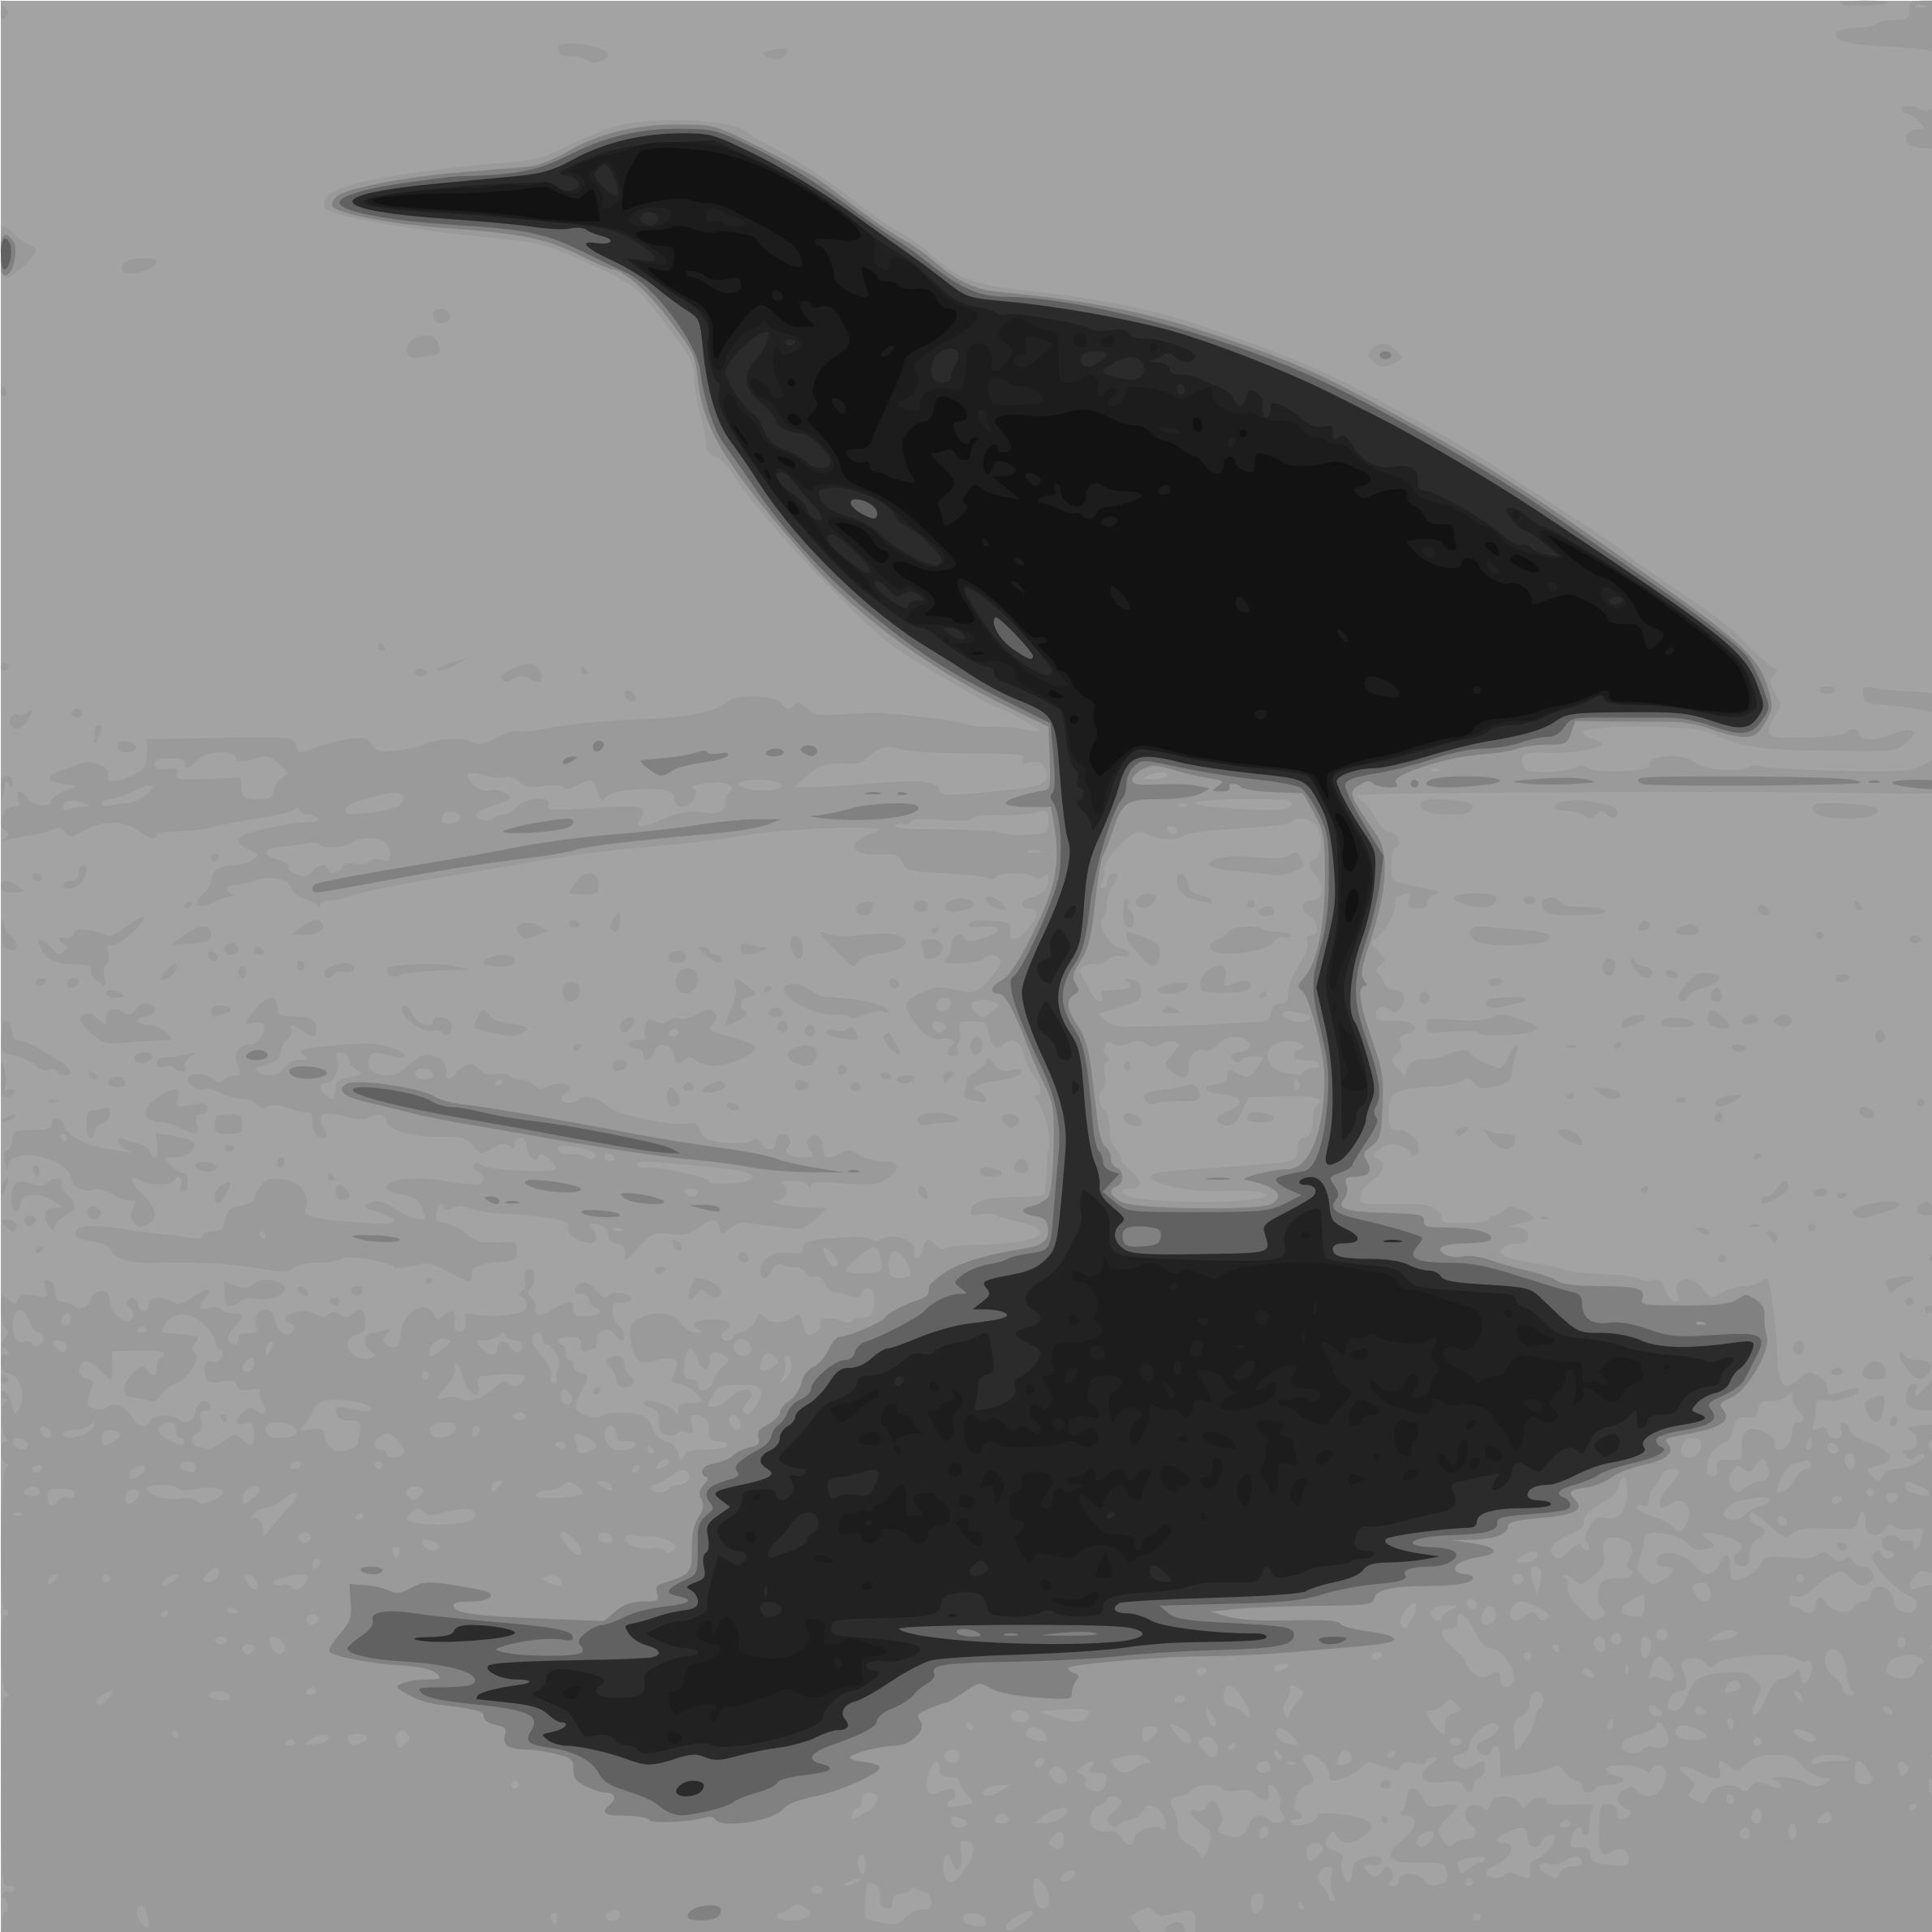 Green Heron clipart #7, Download drawings